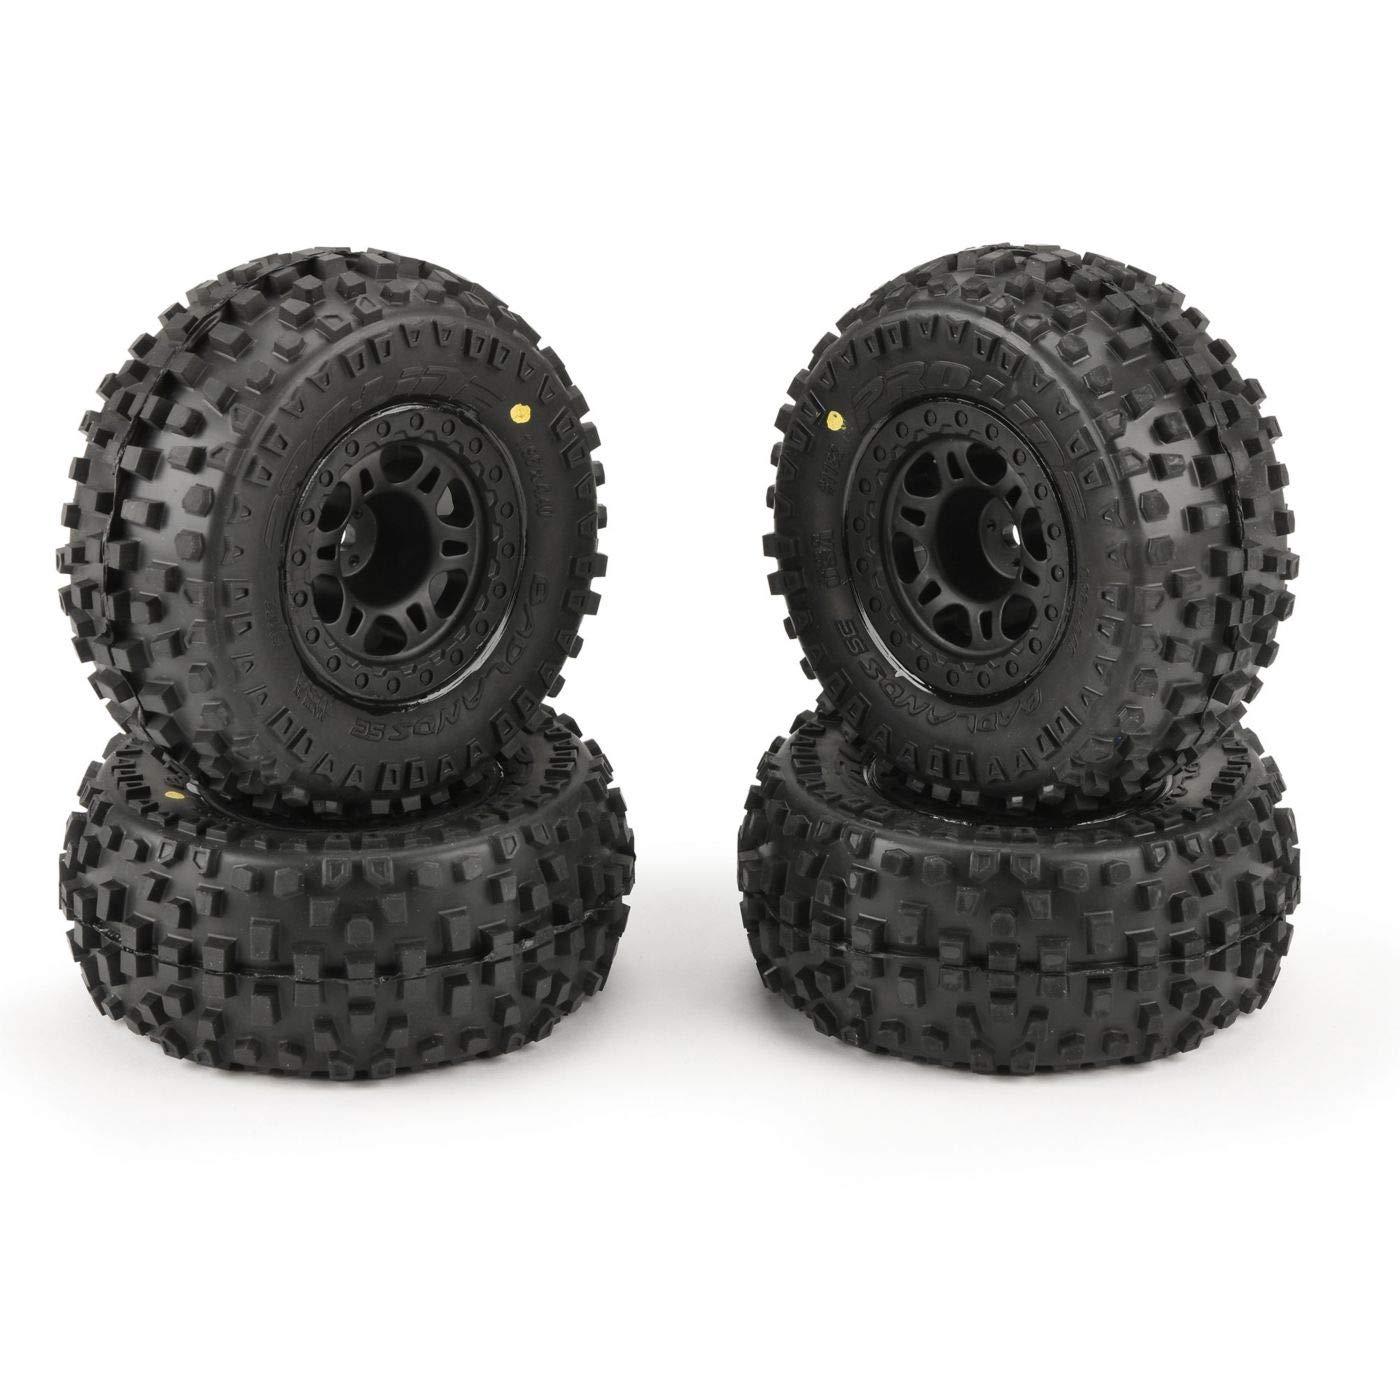 Pro-line Racing Badlands SC 2.2'' 3.0'' Tires MTD (4) Slash 2wd Front/Rear, PRO118230